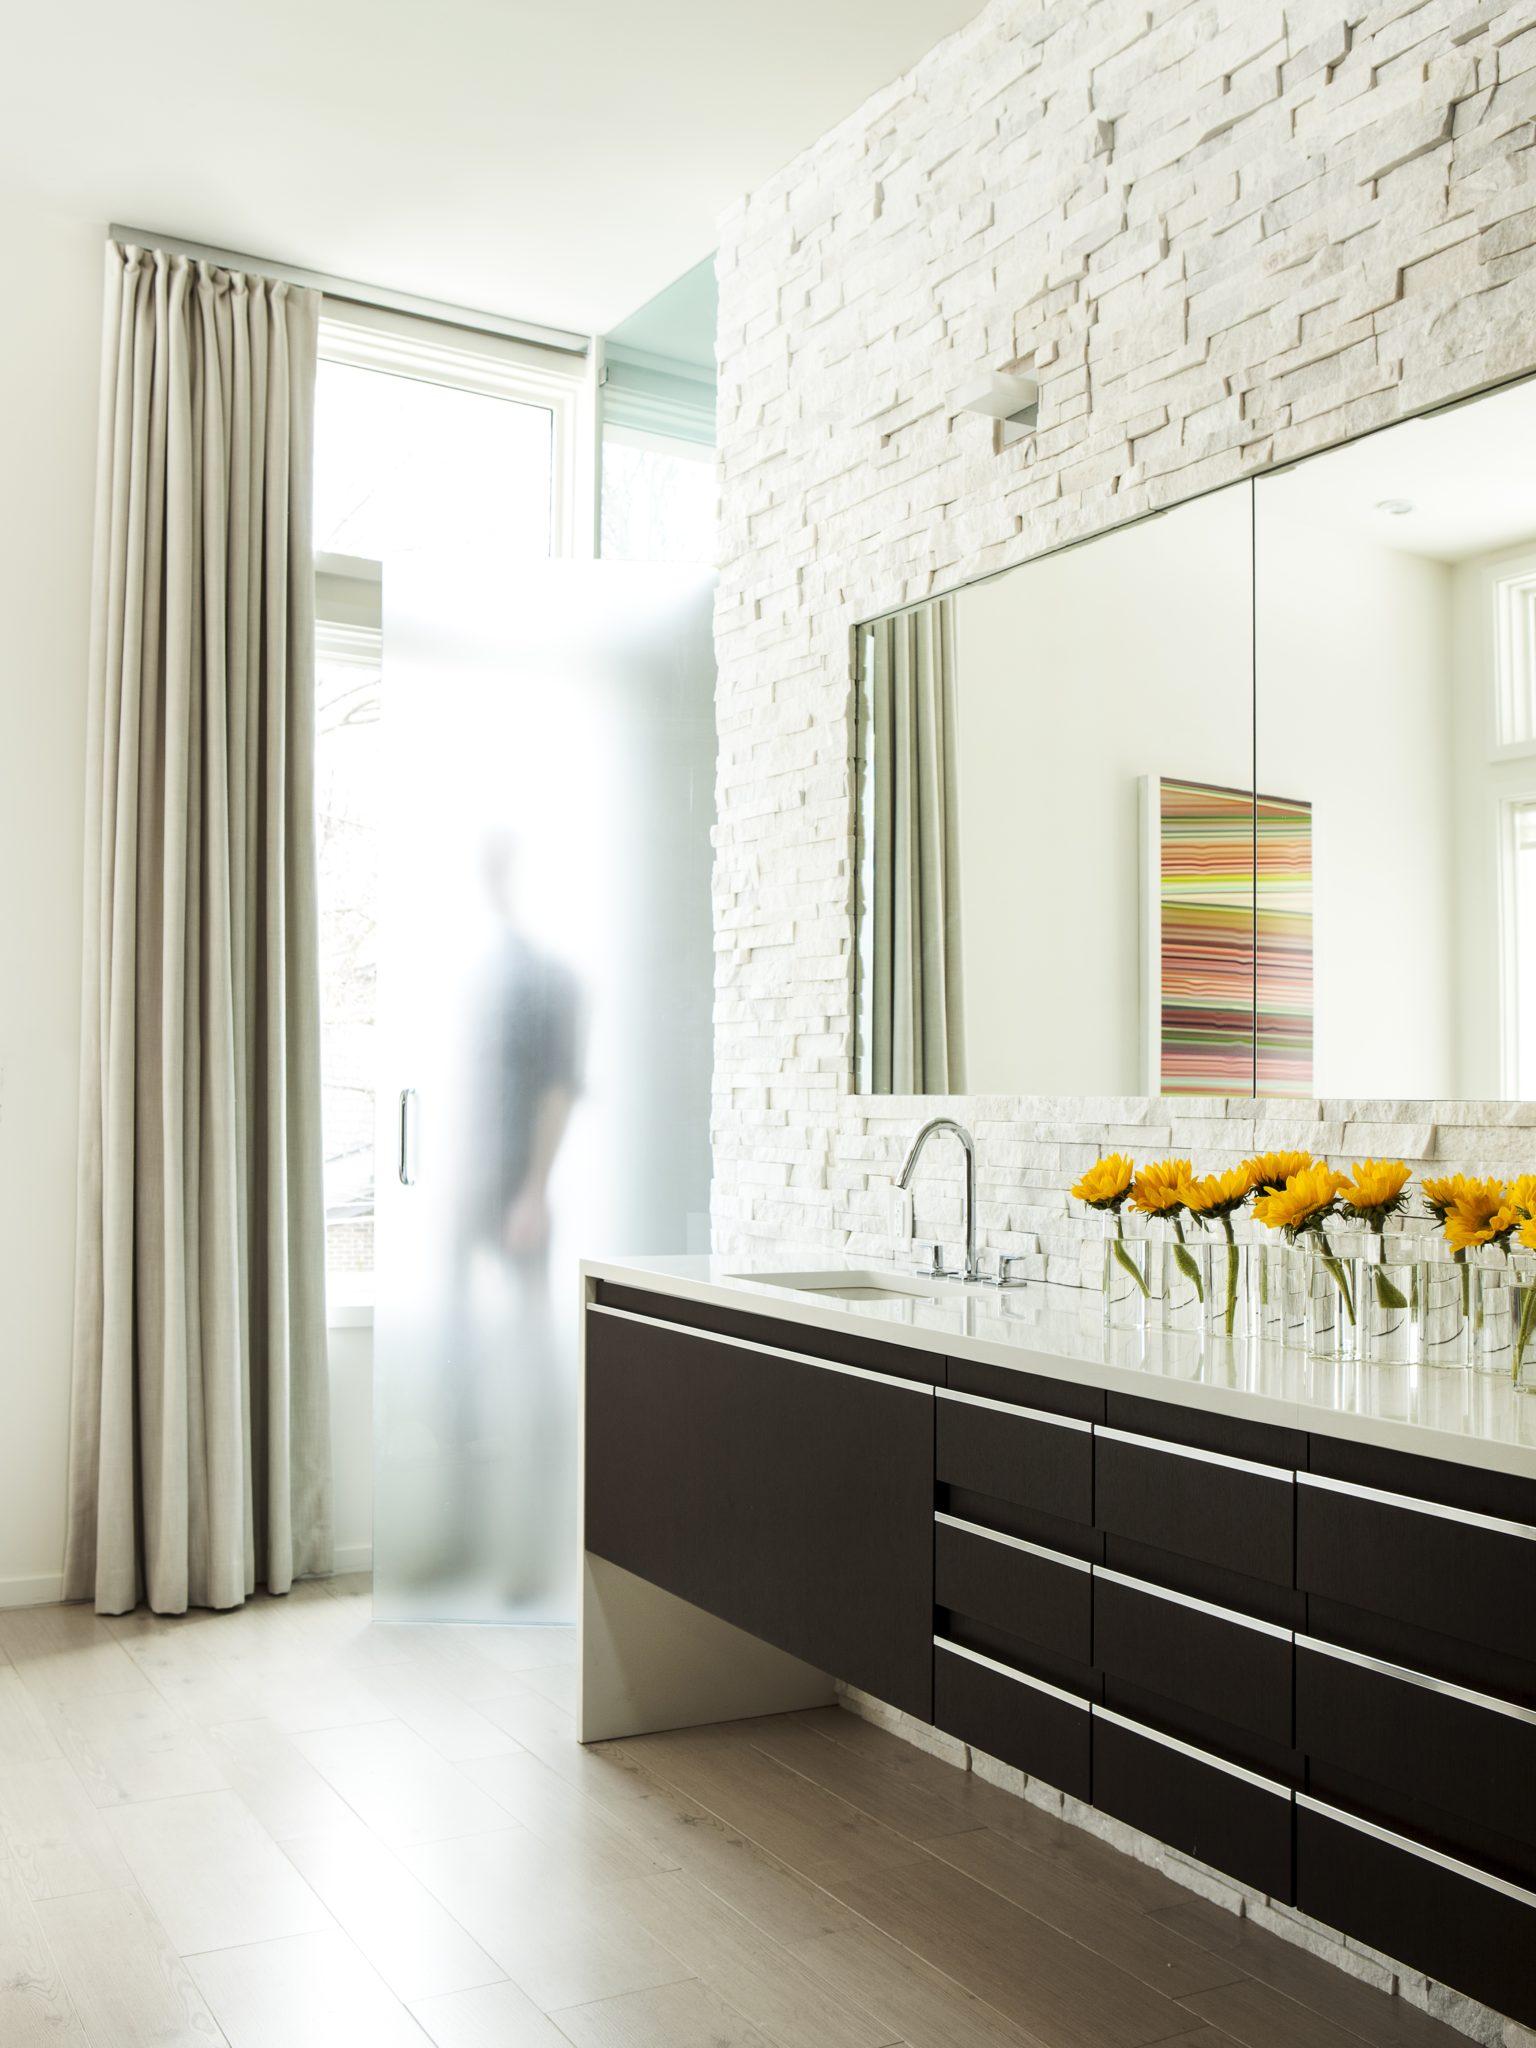 Midtown modern bath by Joel Kelly Design